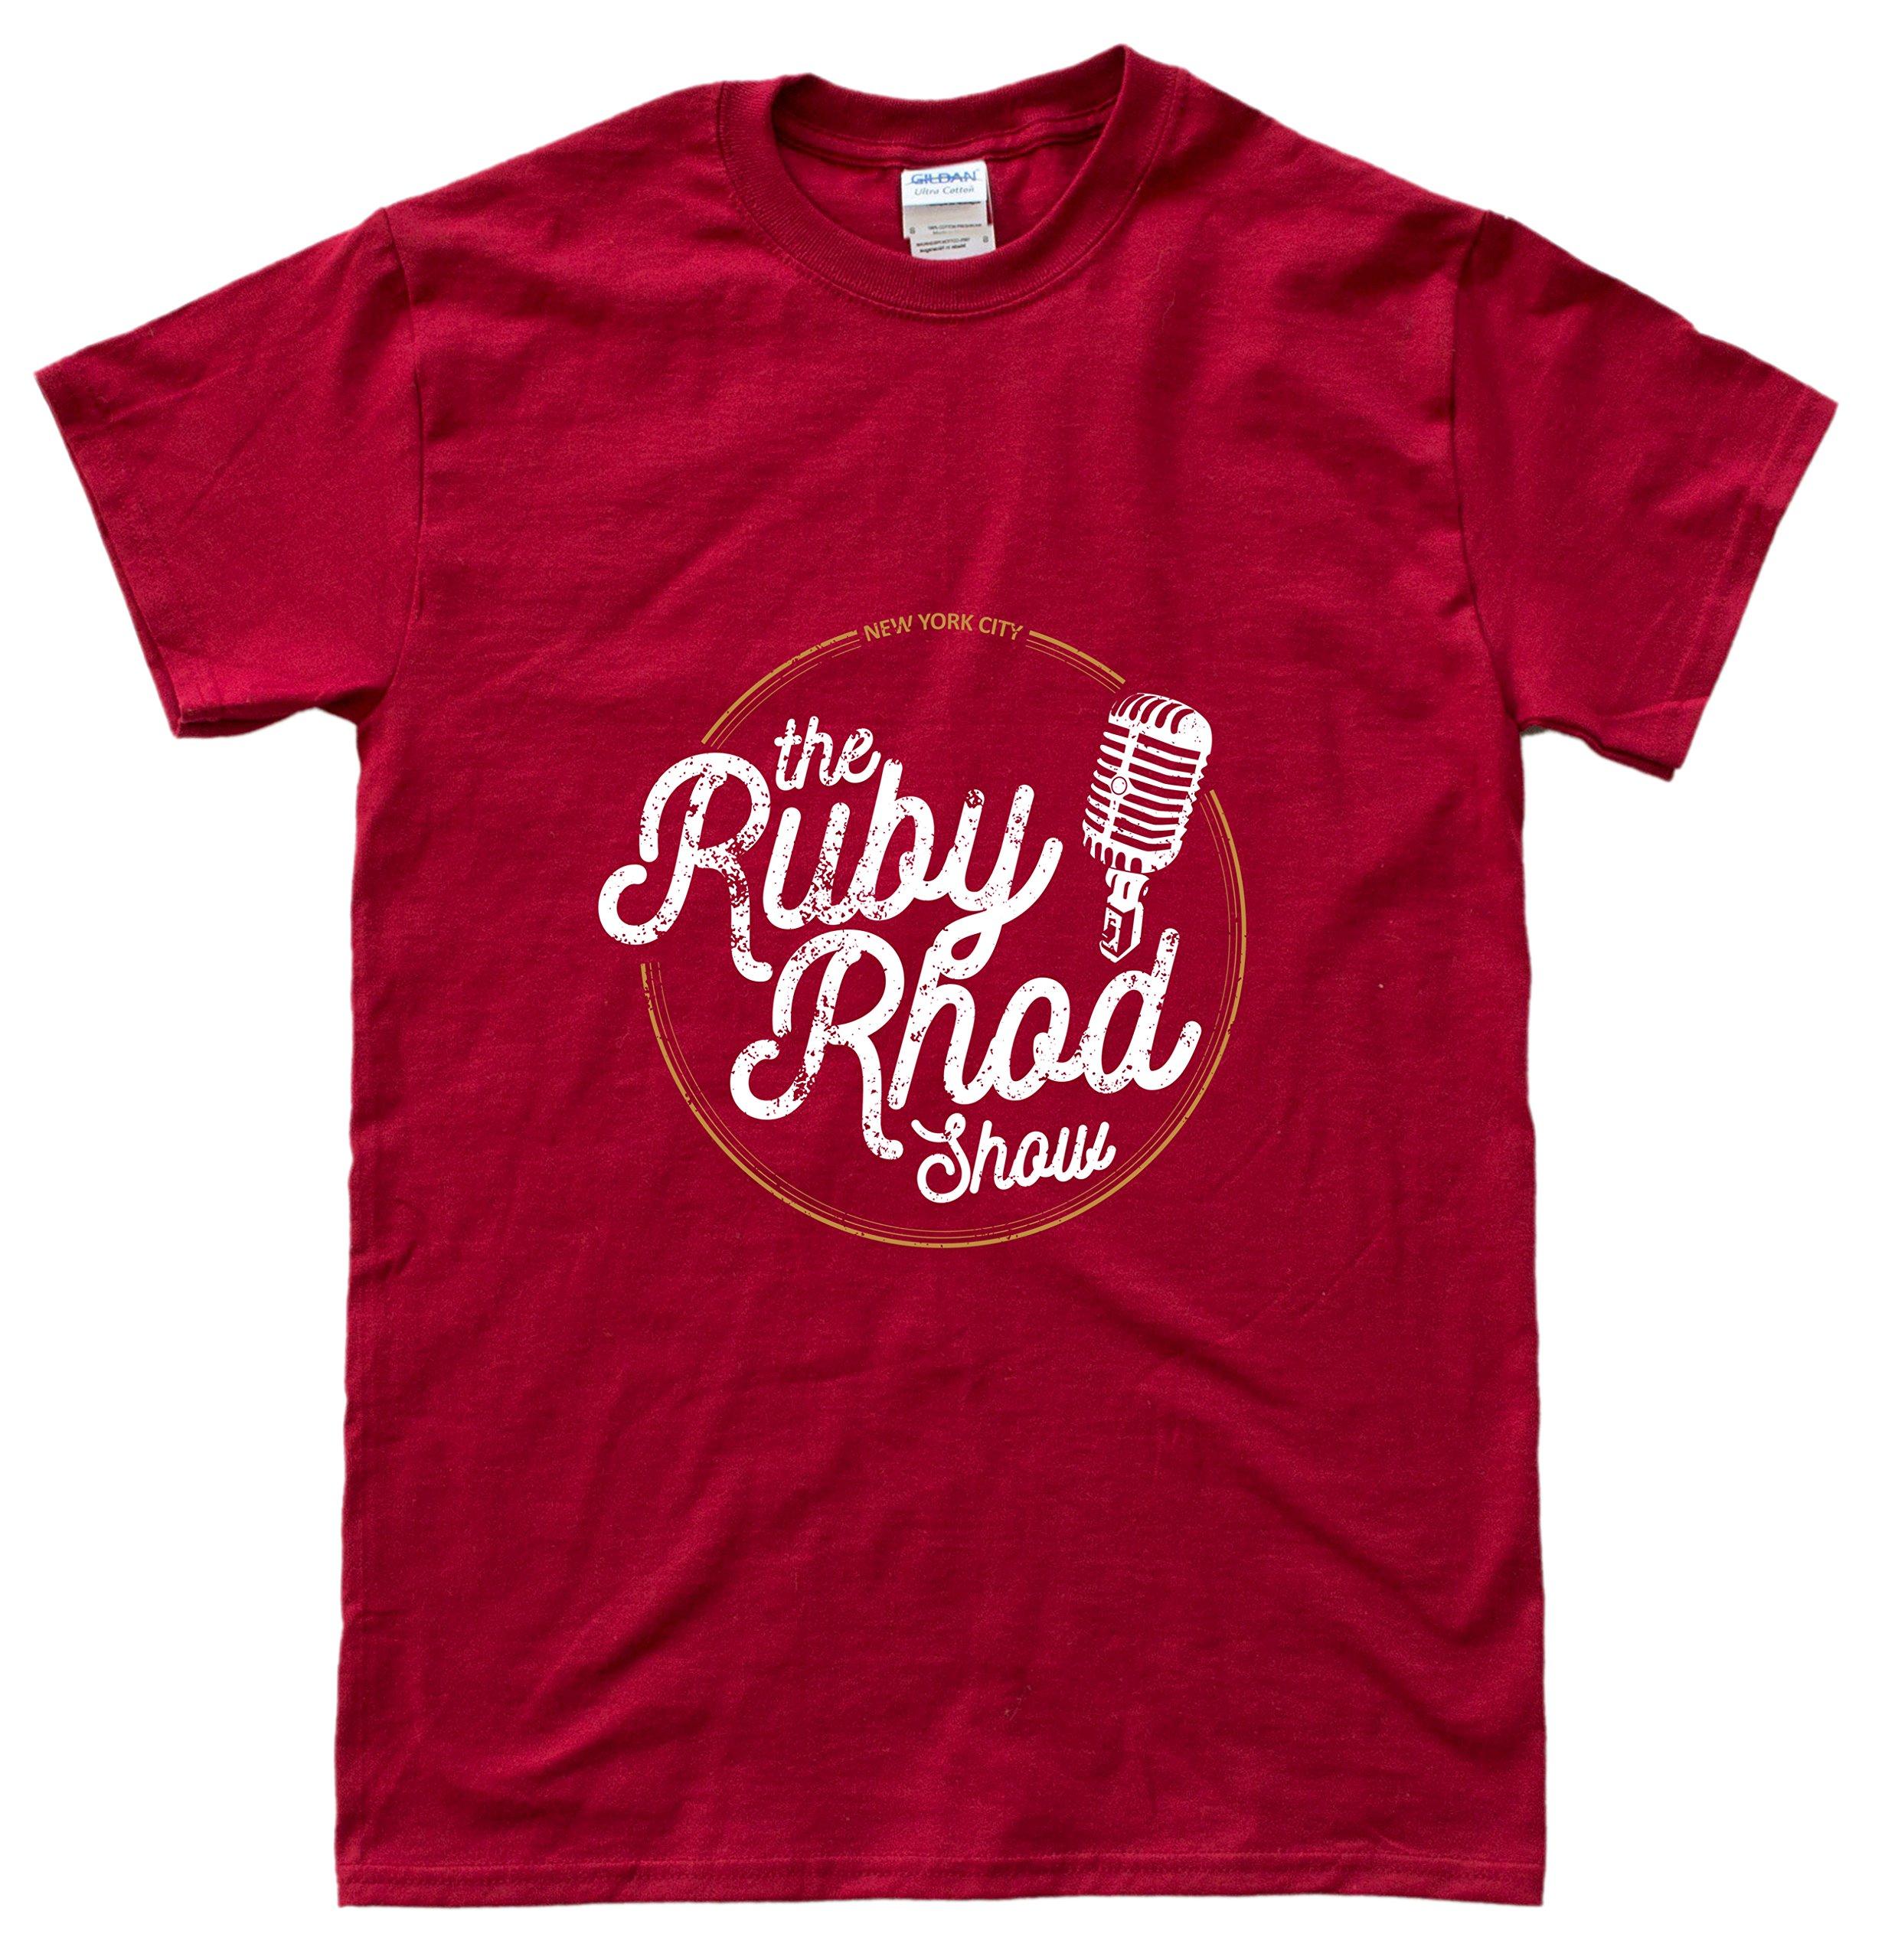 Stooble S The Ruby Rhod Show Tshirt